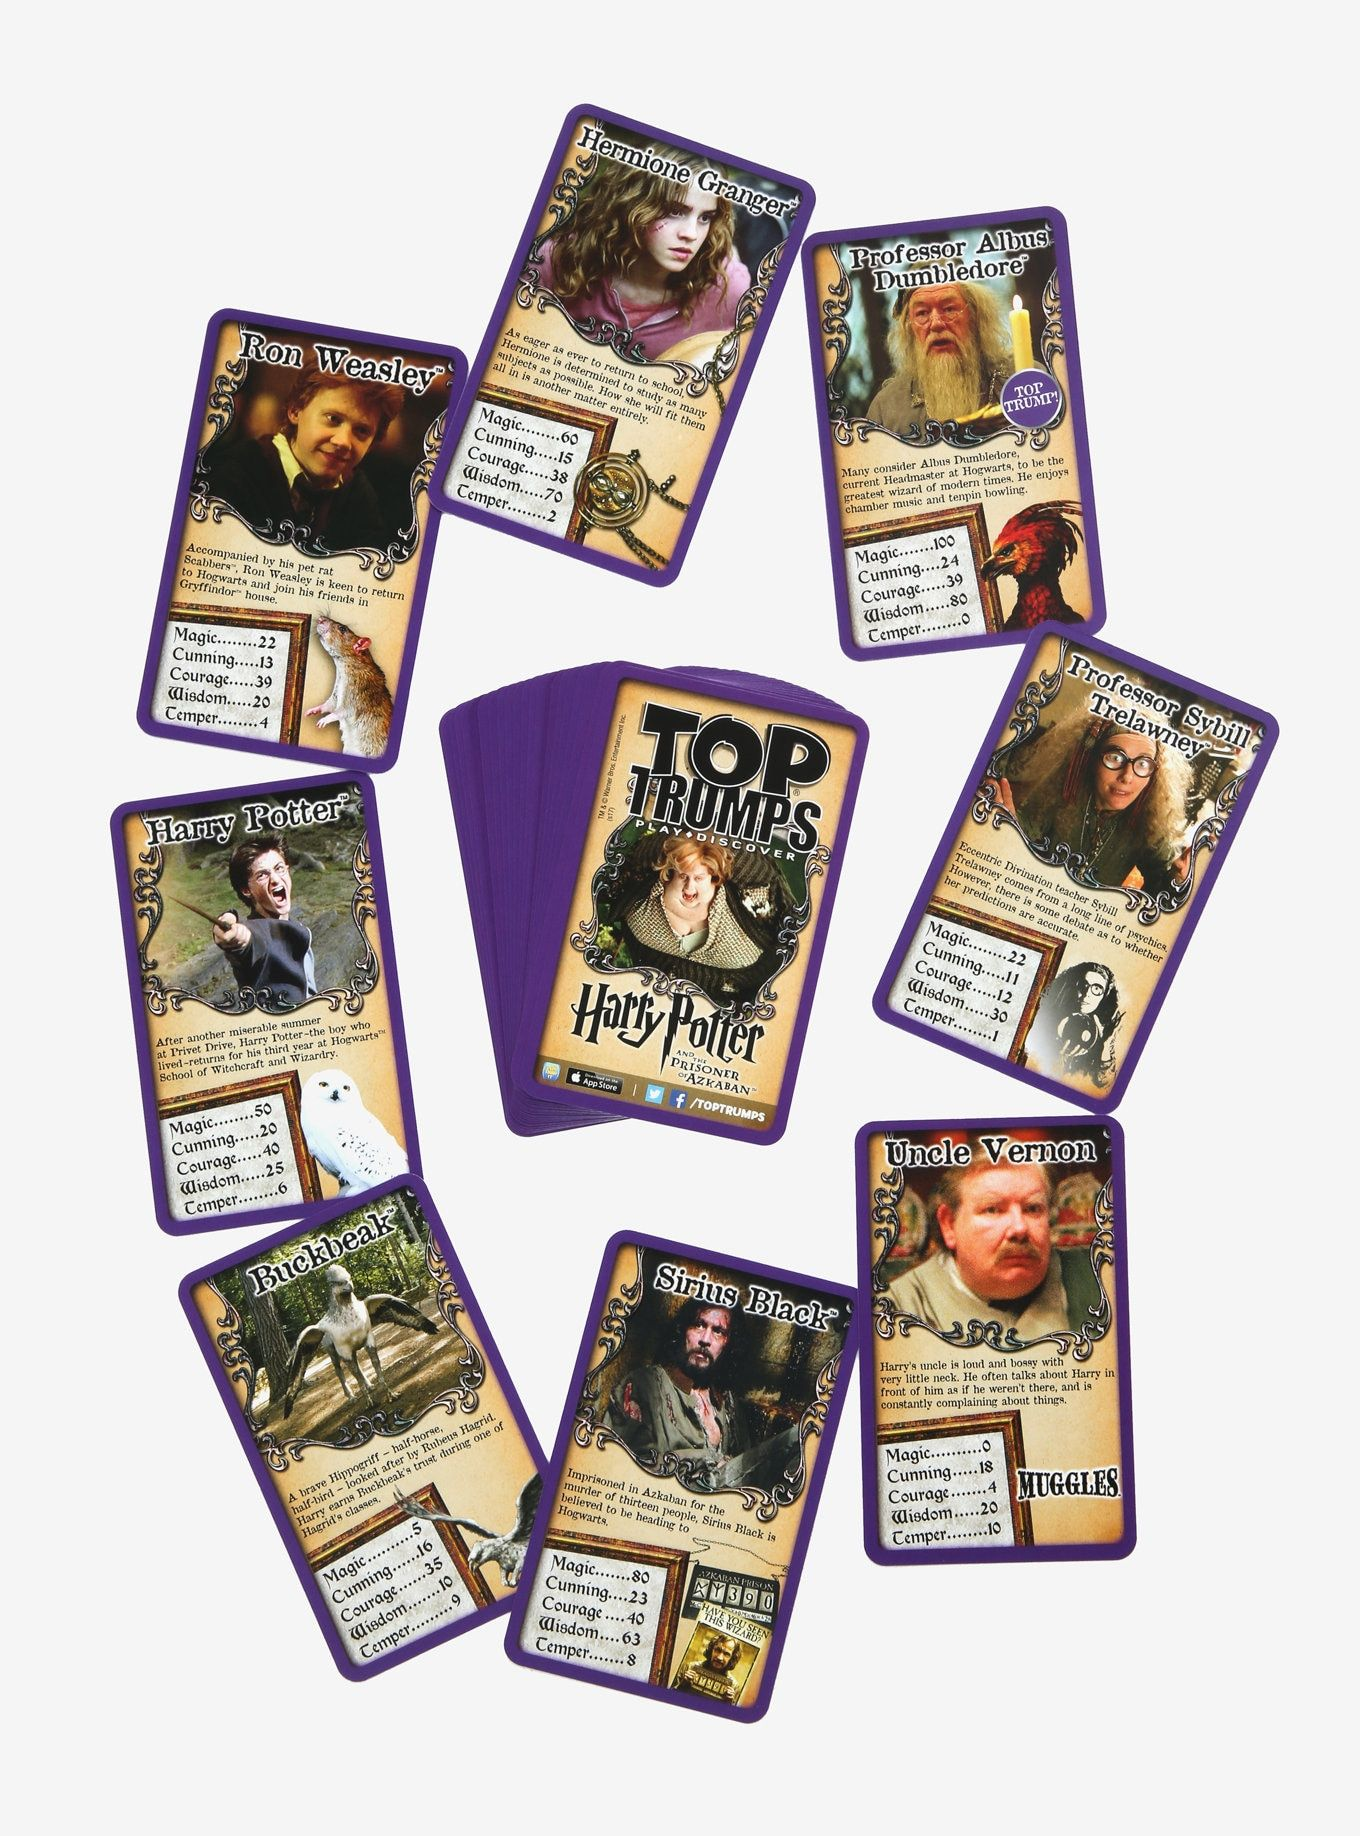 Harry Potter The Prisoner Of Azkaban Top Trumps Card Game Card